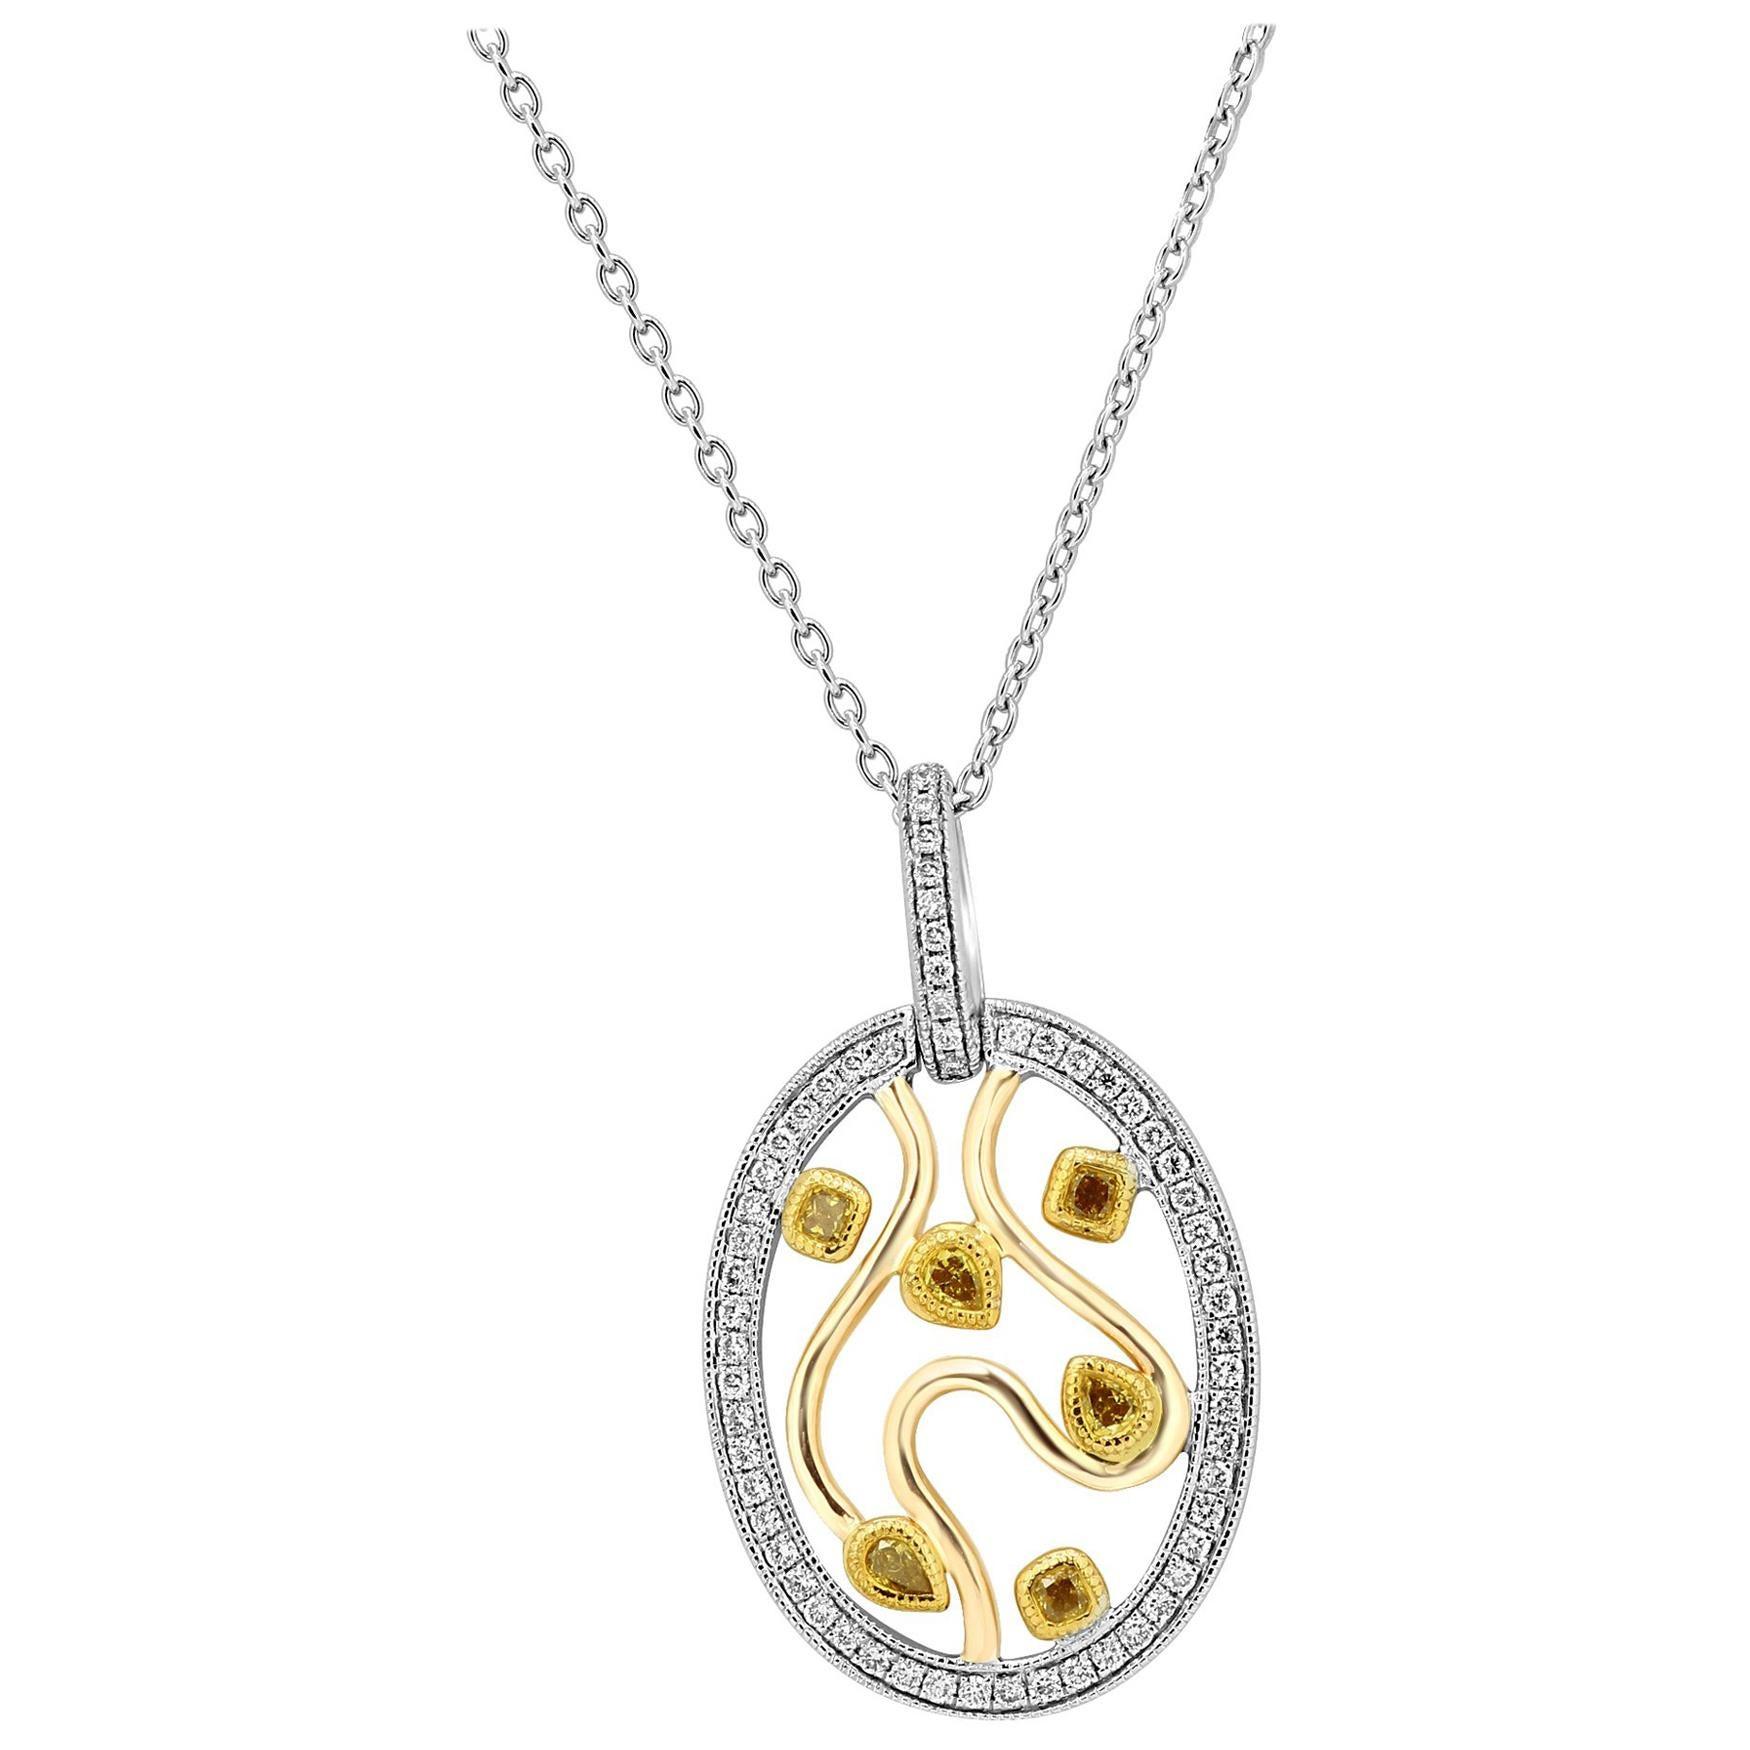 Natural Fancy Color Diamond Three-Color Gold Medallion Pendant Necklace